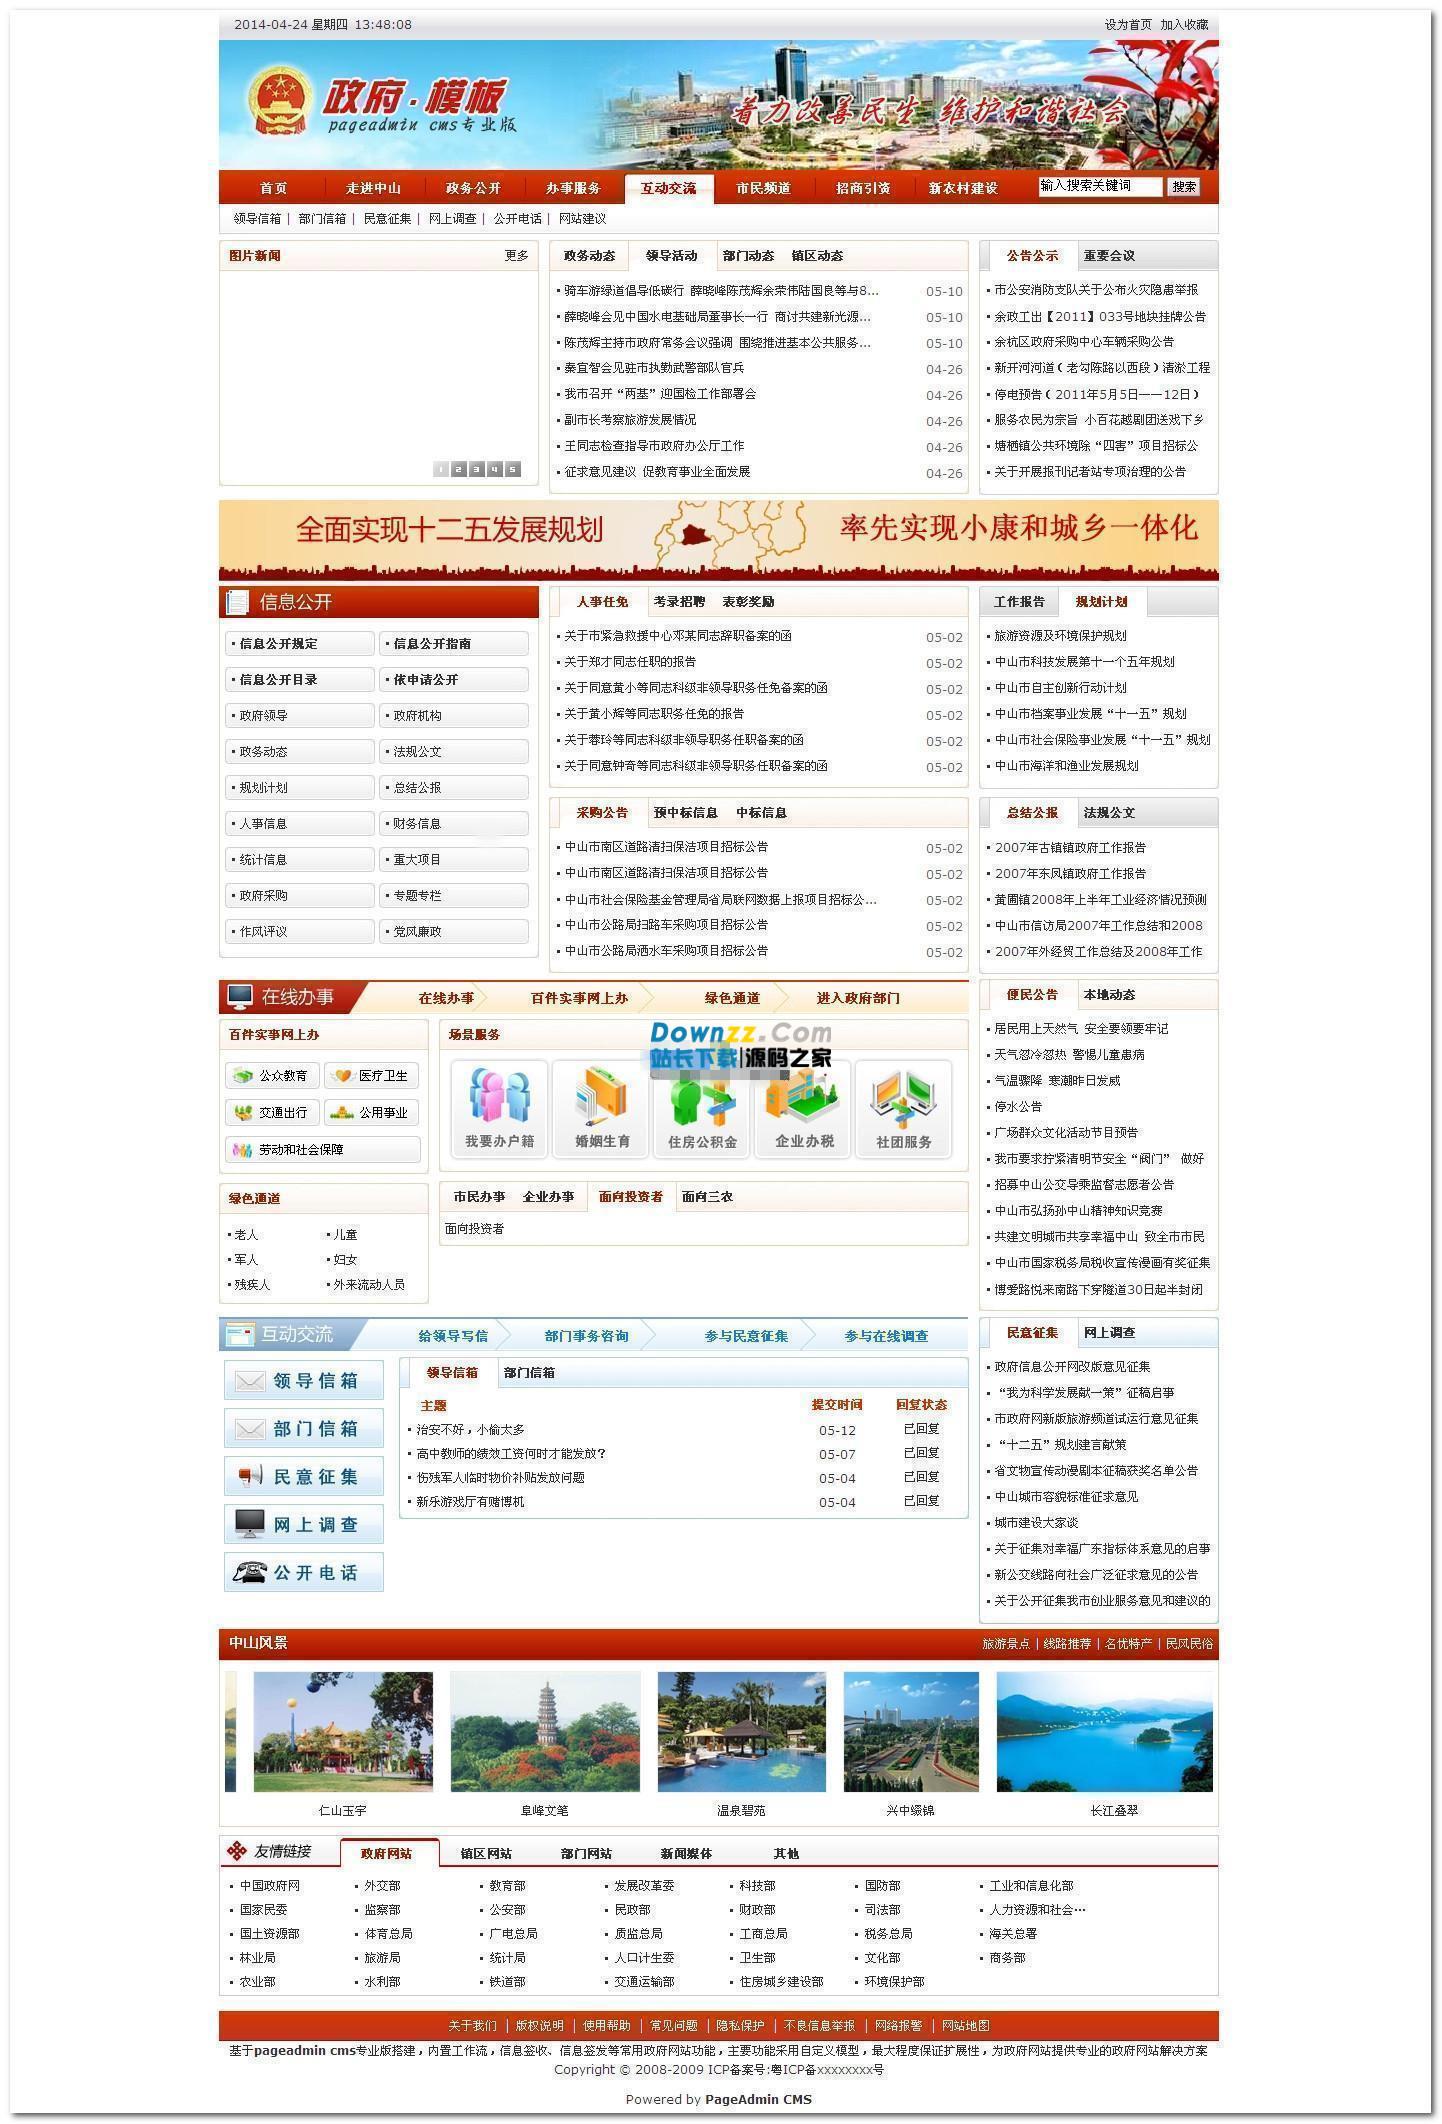 PageAdmin政府网站管理系统 v3.0 build170714